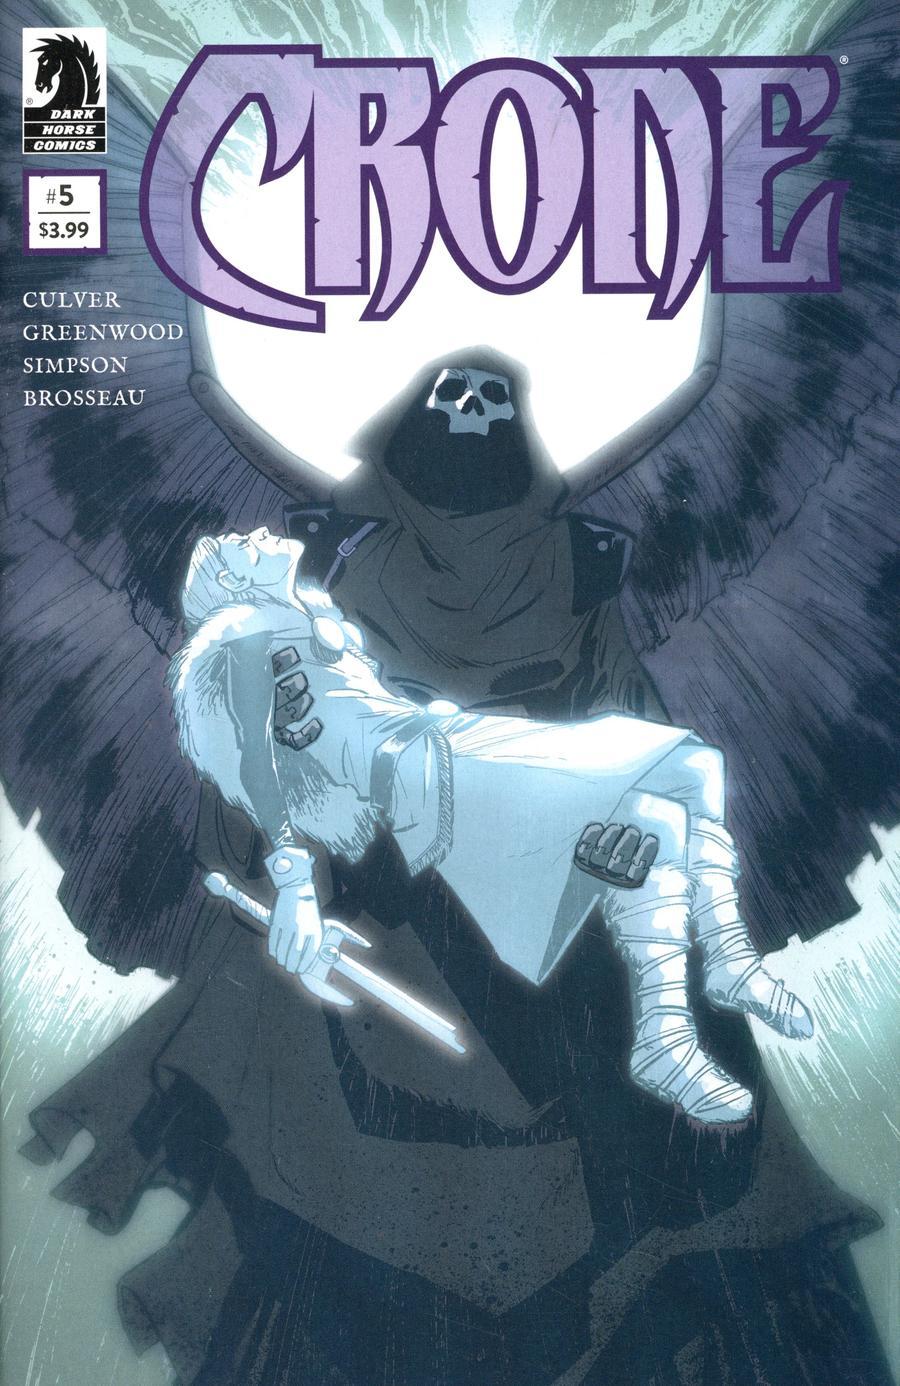 Crone #5